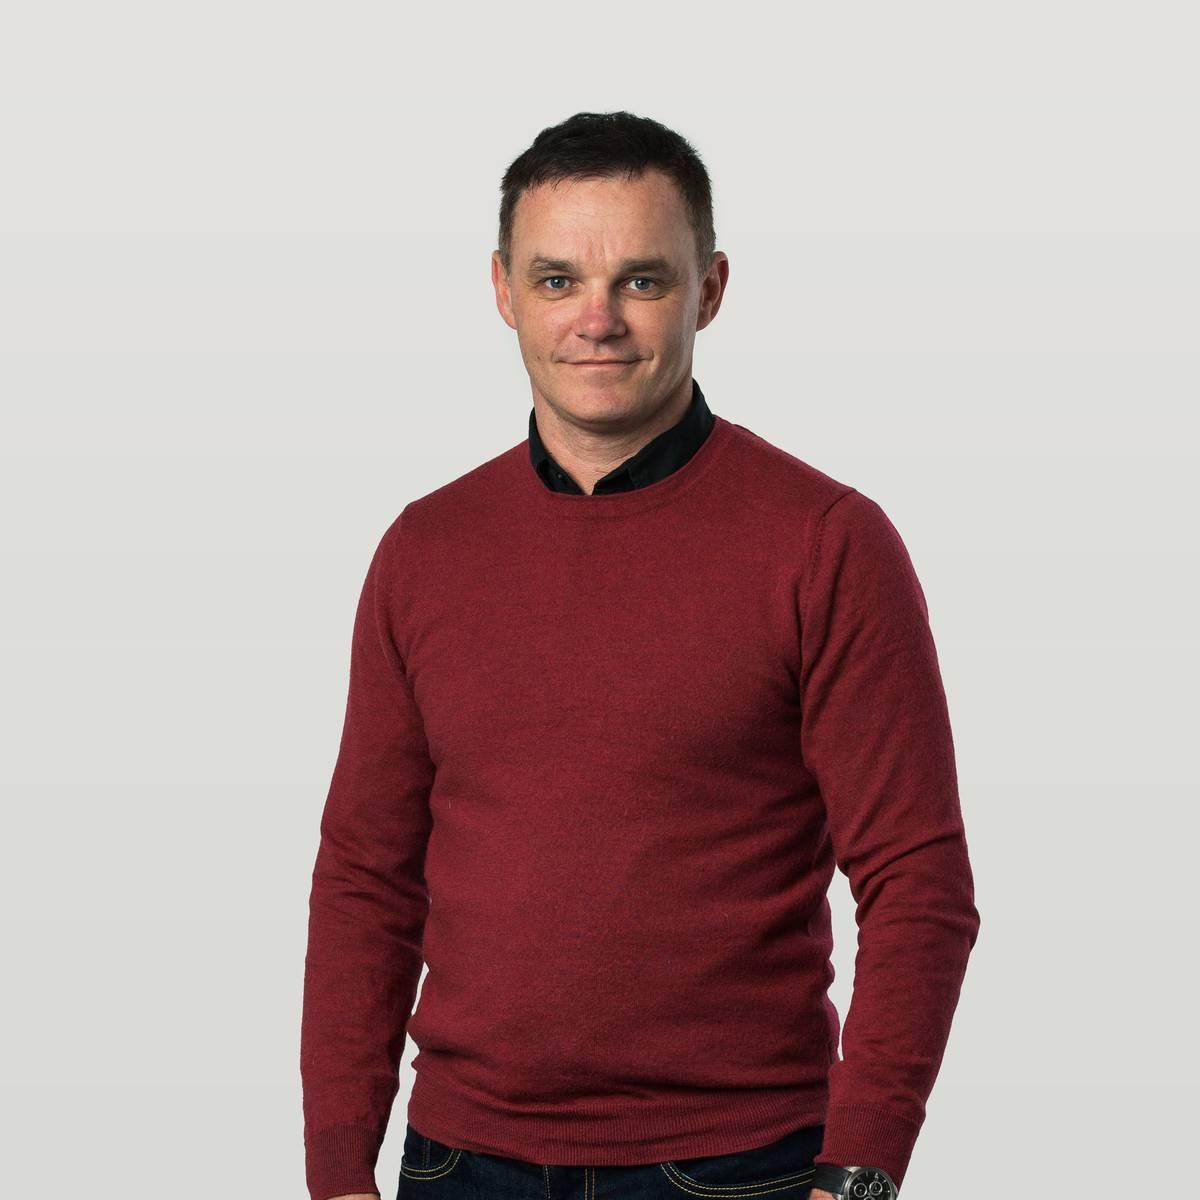 A profile image of Logan Hodgson